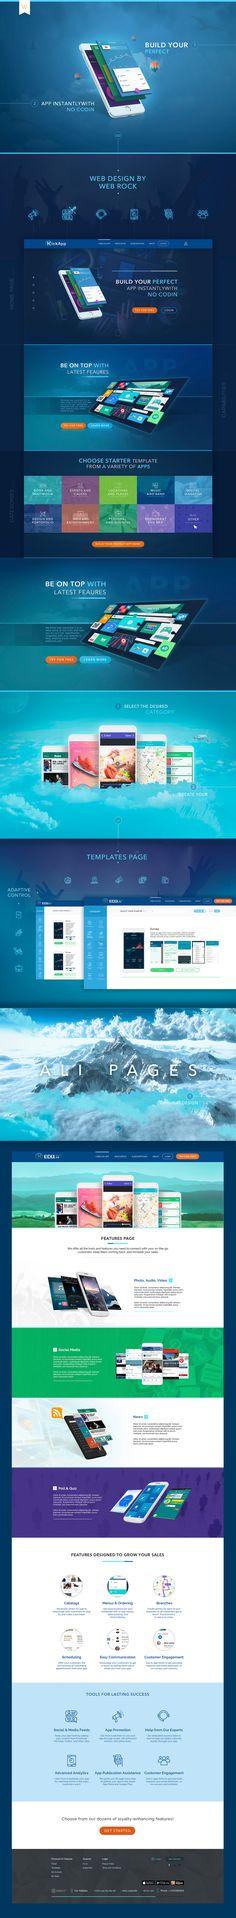 Creating a website design, mobile applications designer (KickAss)